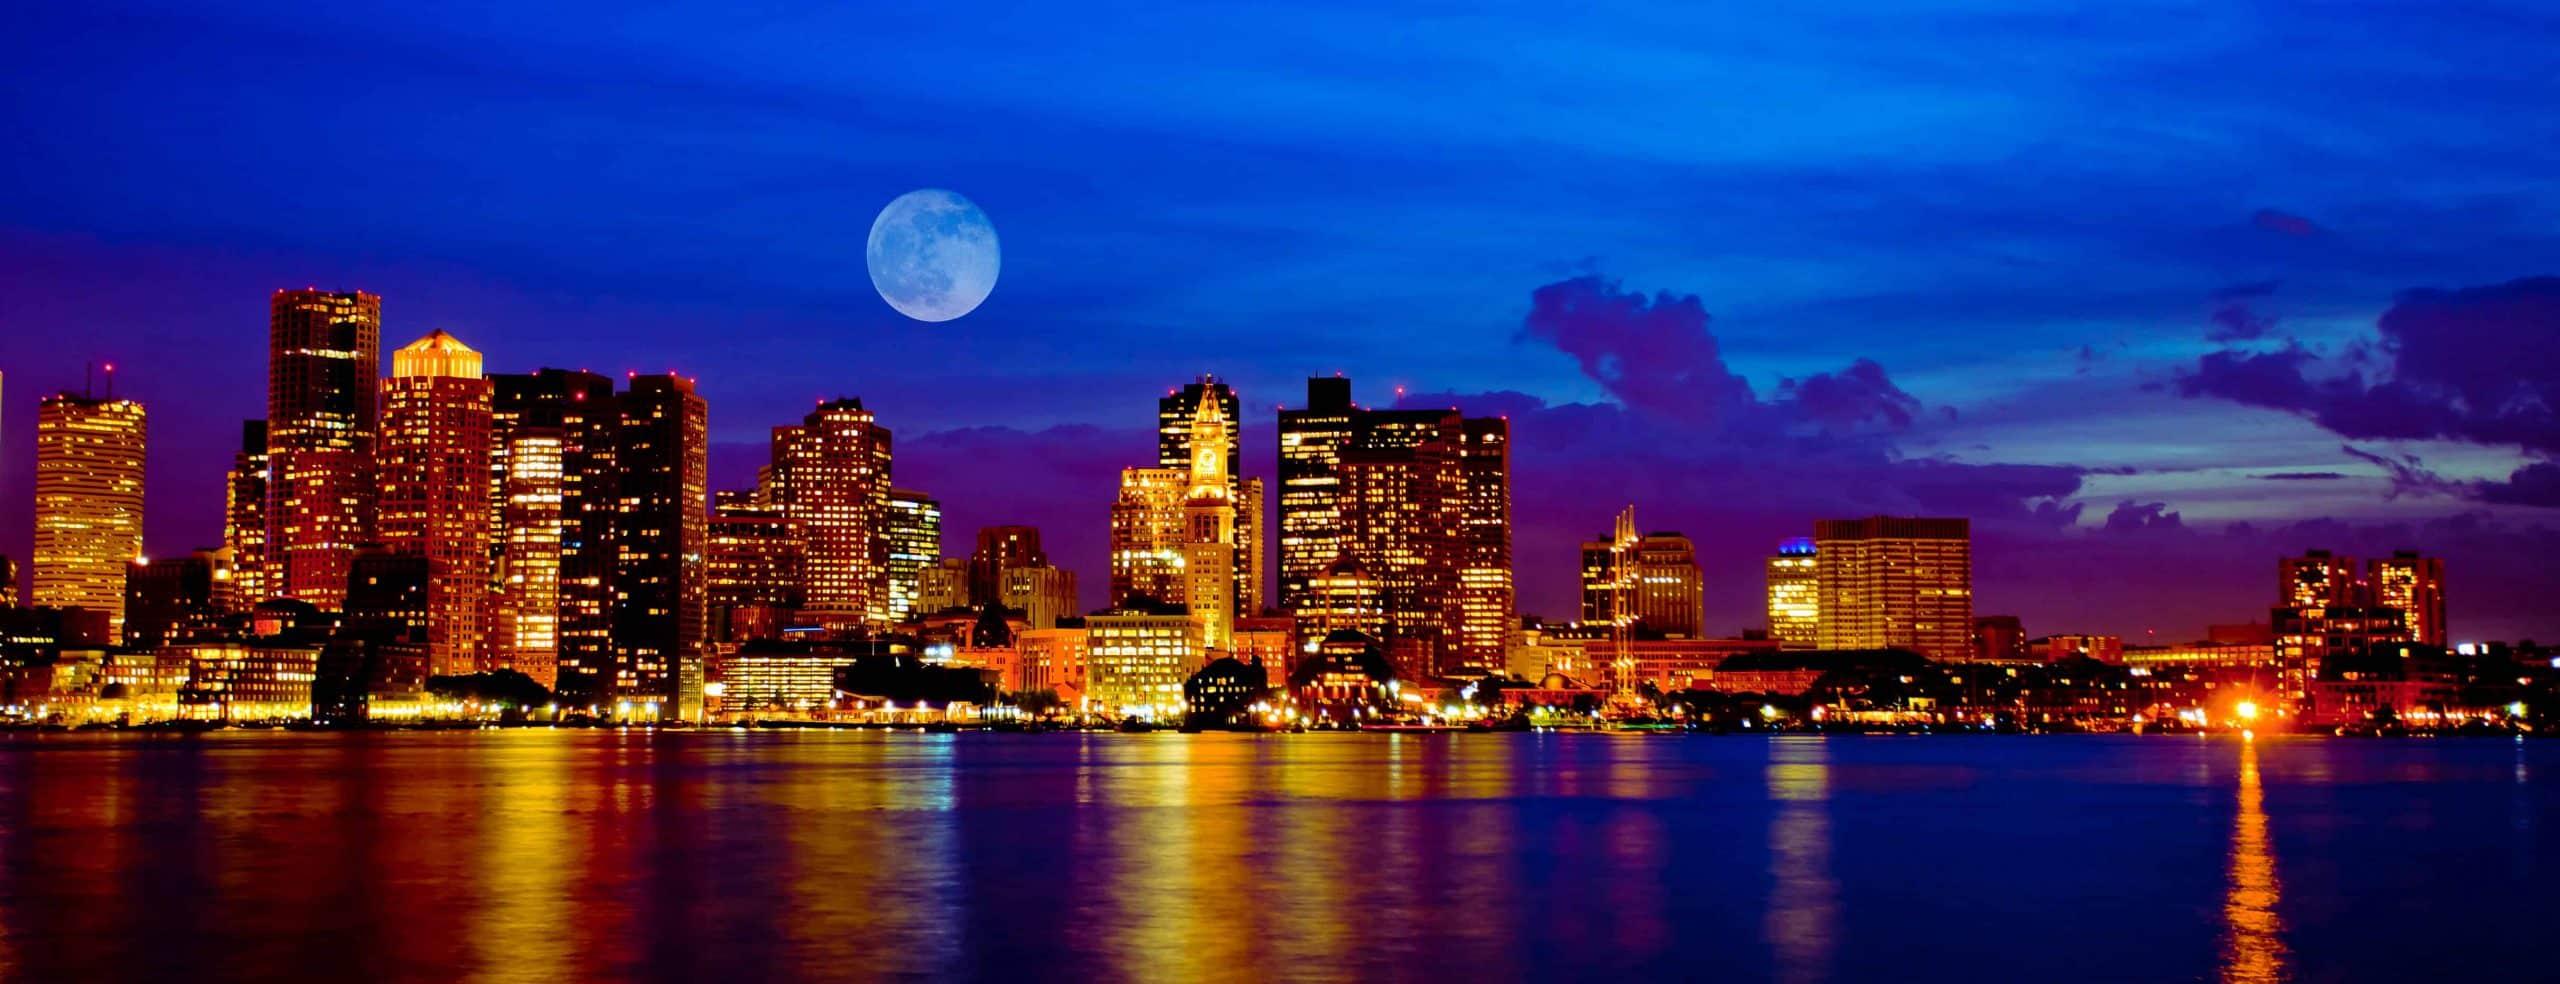 Top Startups Moving to Boston 2019